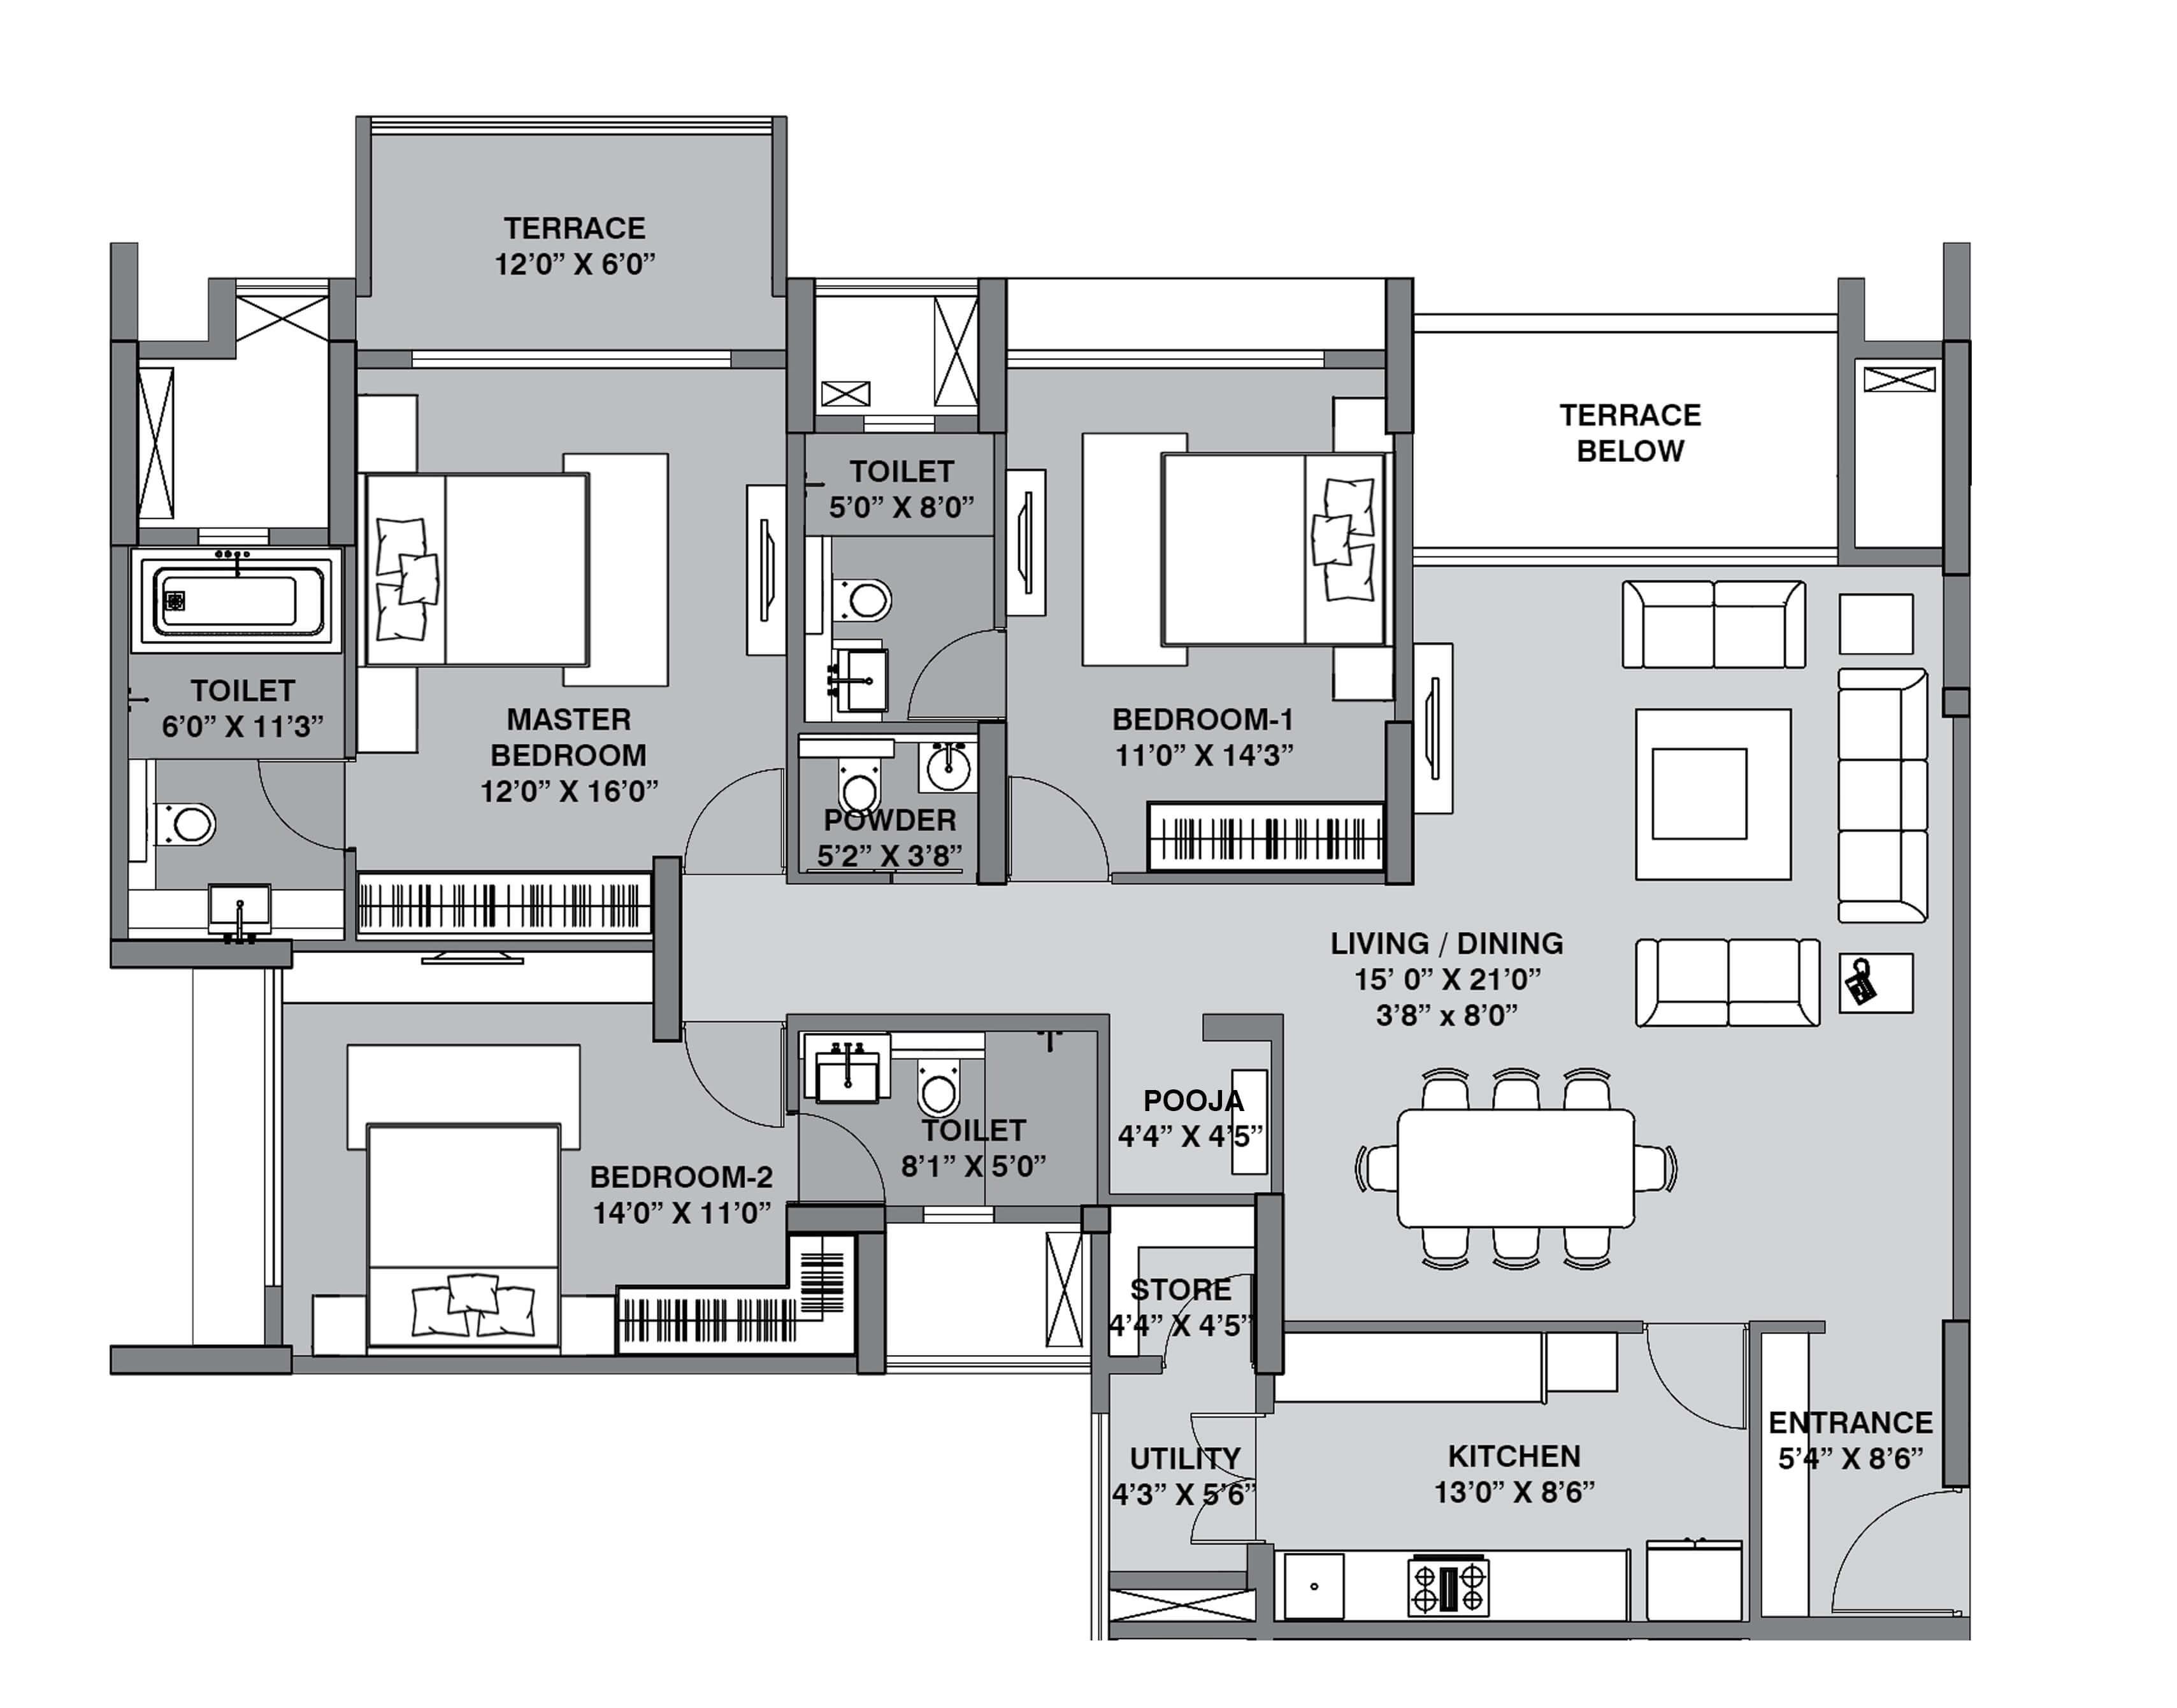 lodha belmondo apartment 3bhk 1435sqft 1